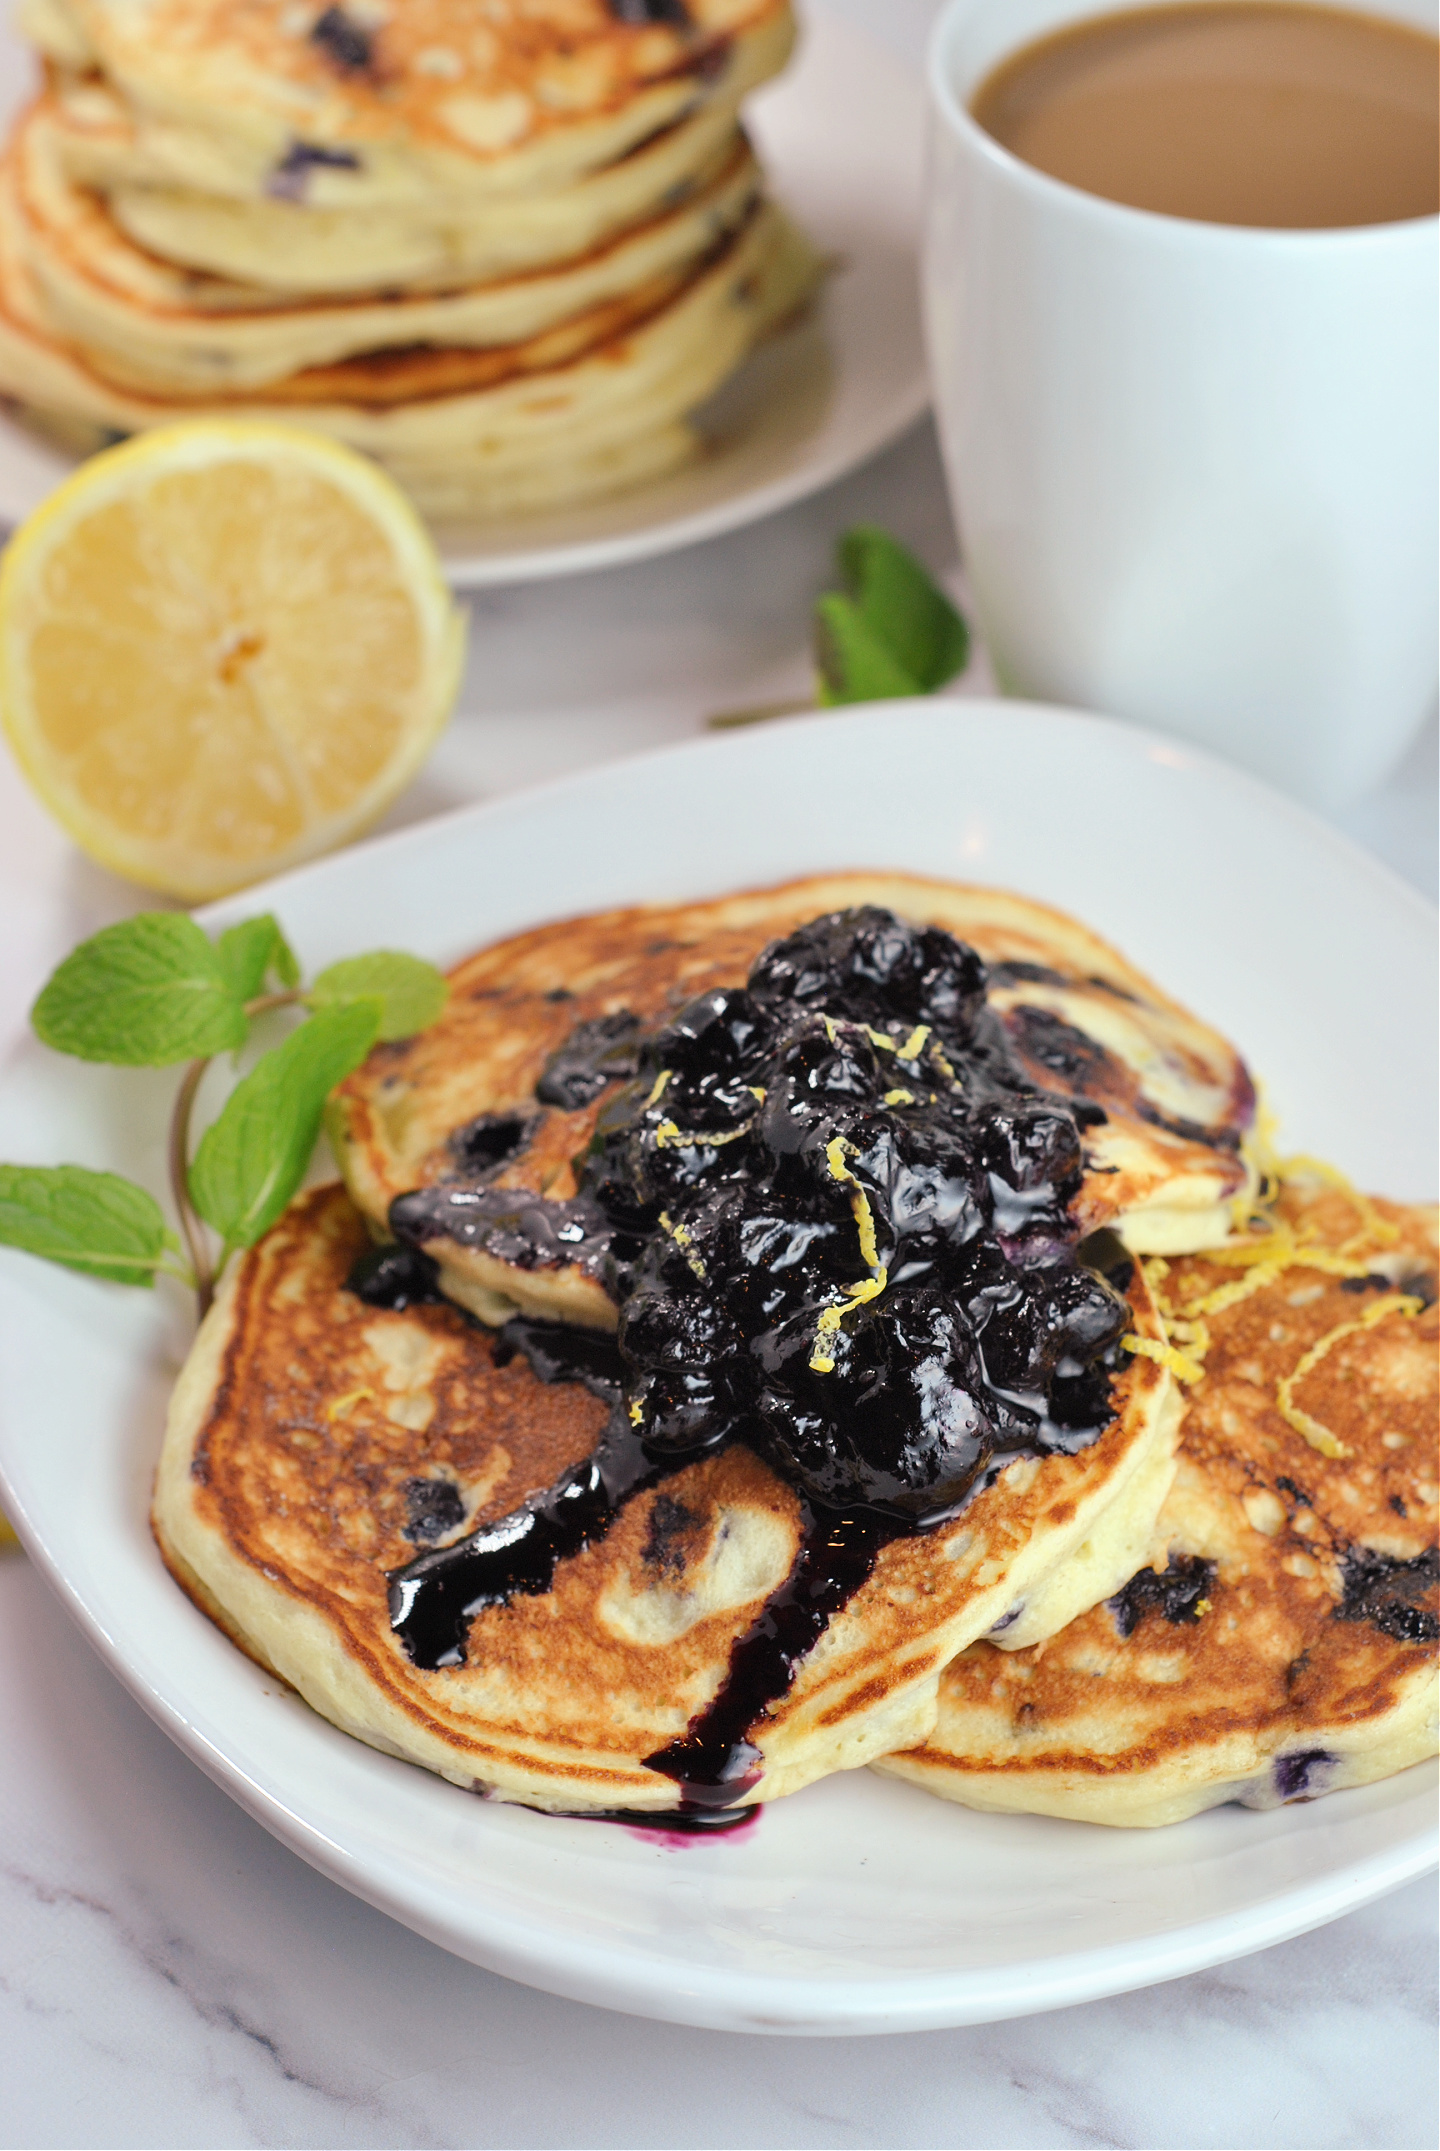 Lemon Ricotta Blueberry Pancakes with Blueberry Compote via @preventionrd